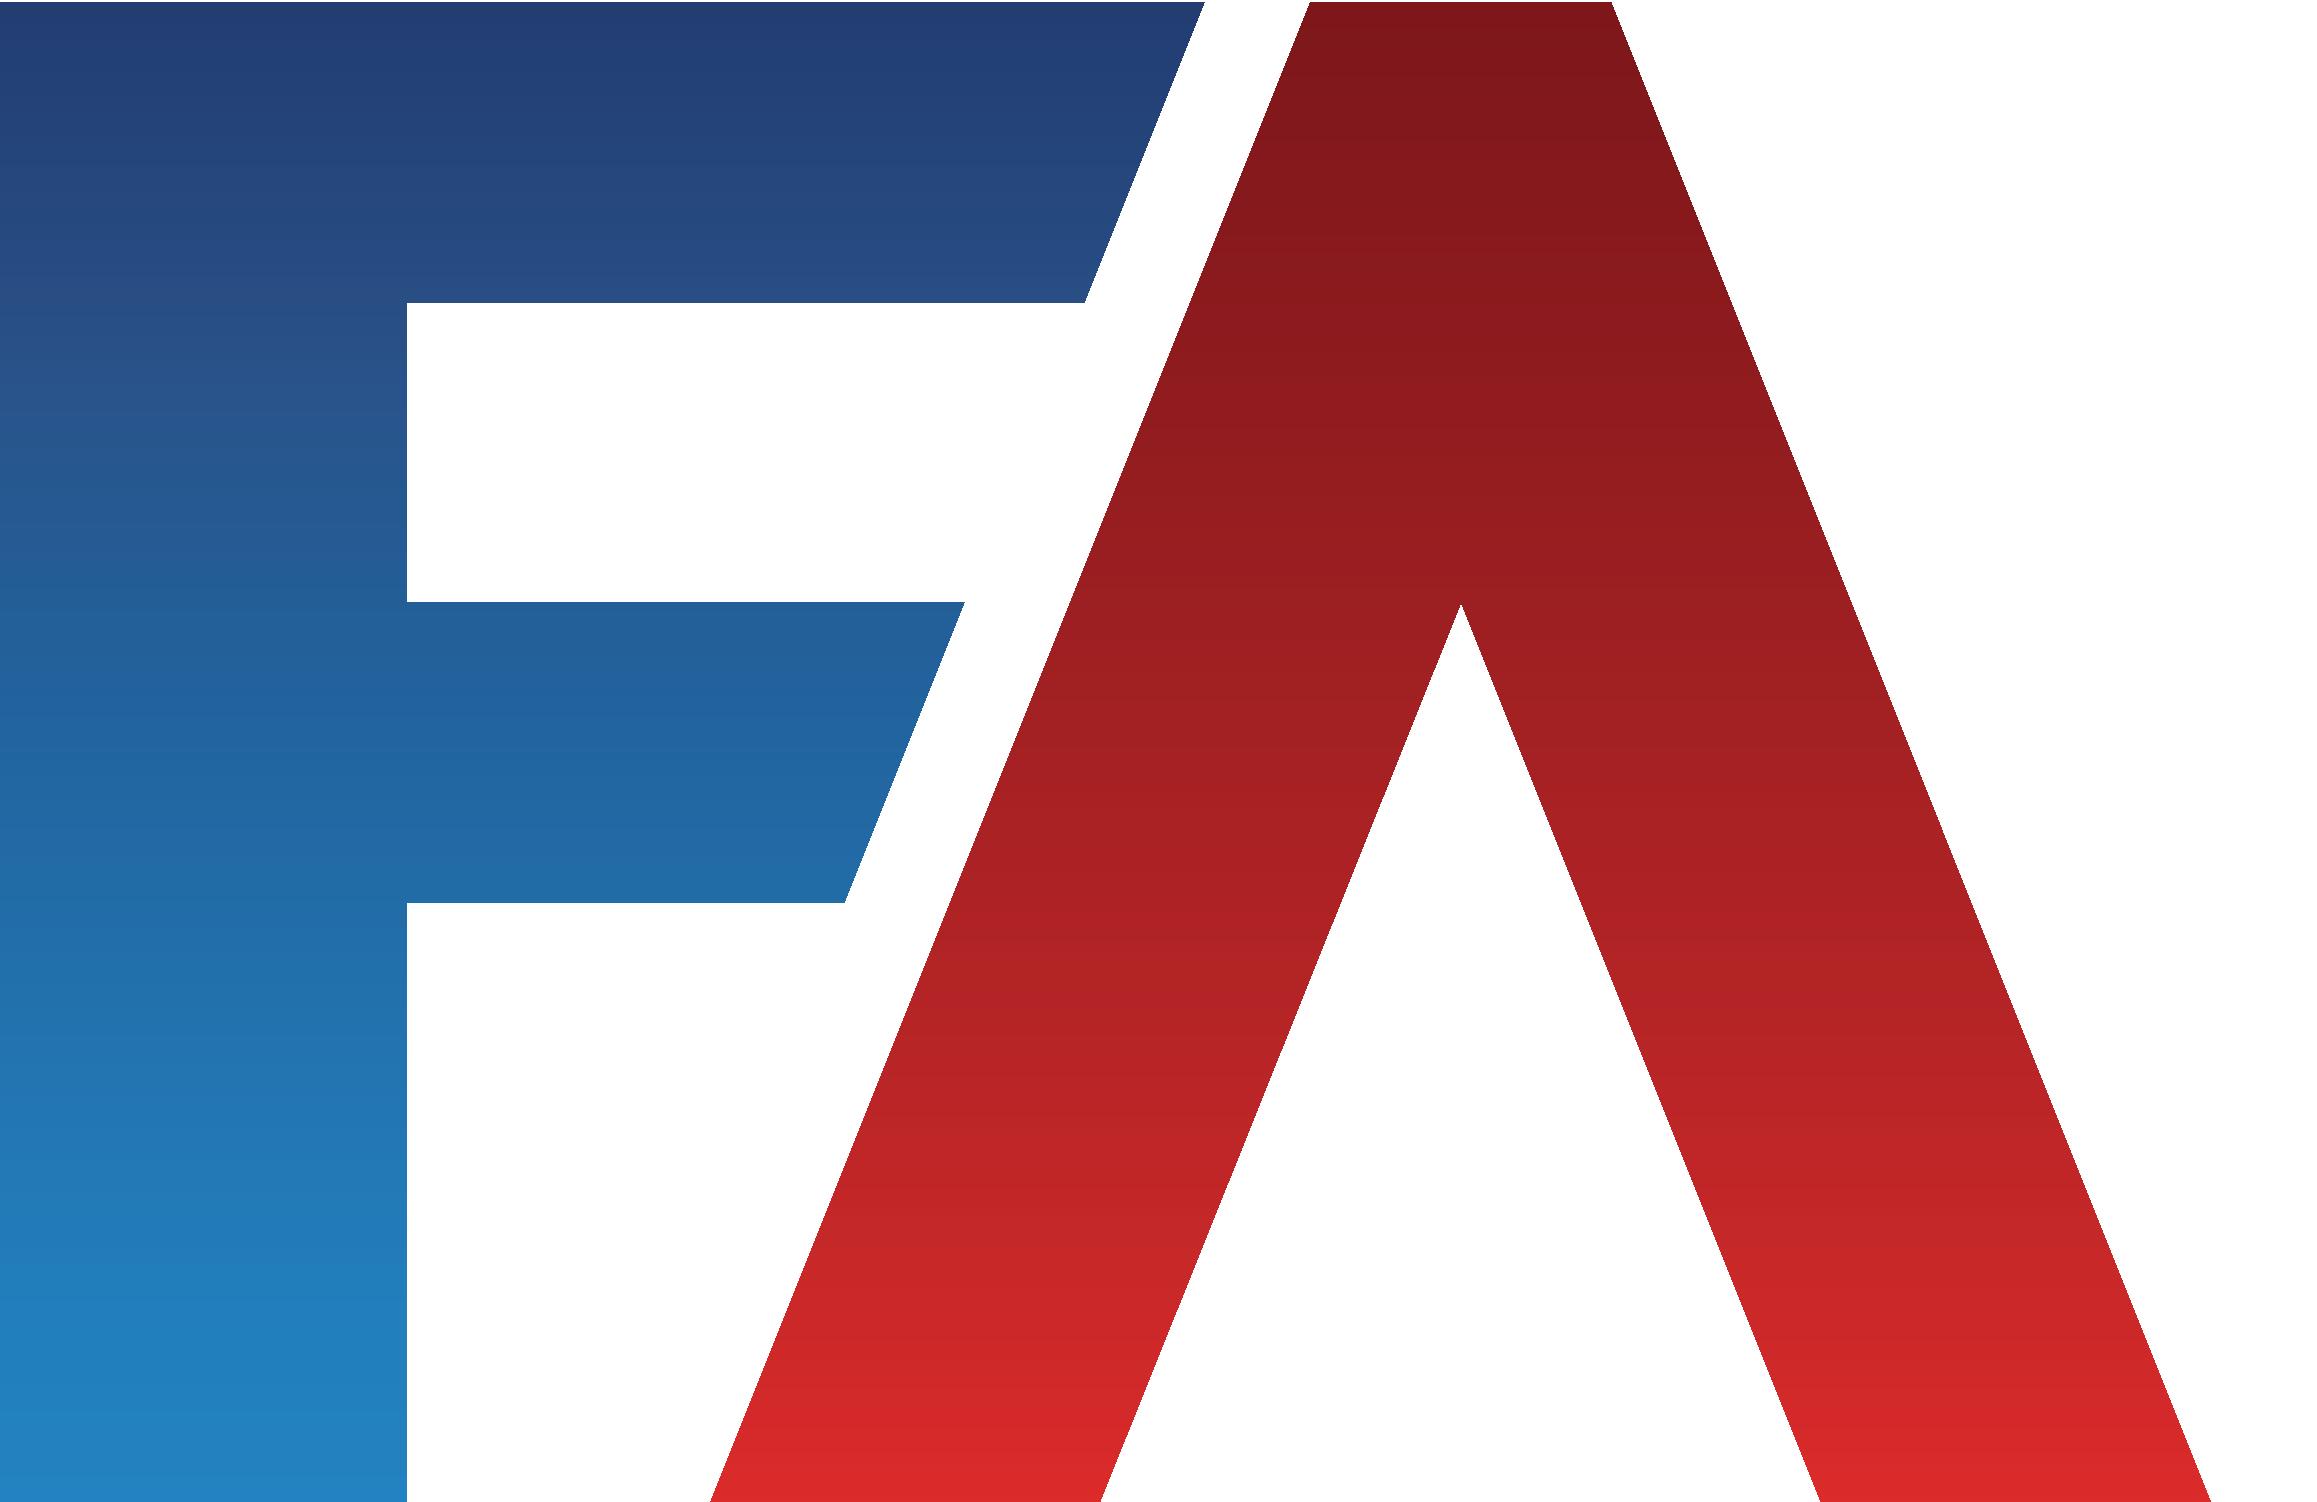 Fantasy Alarm - $4 Million Fanduel Event | FantasyAlarm.com